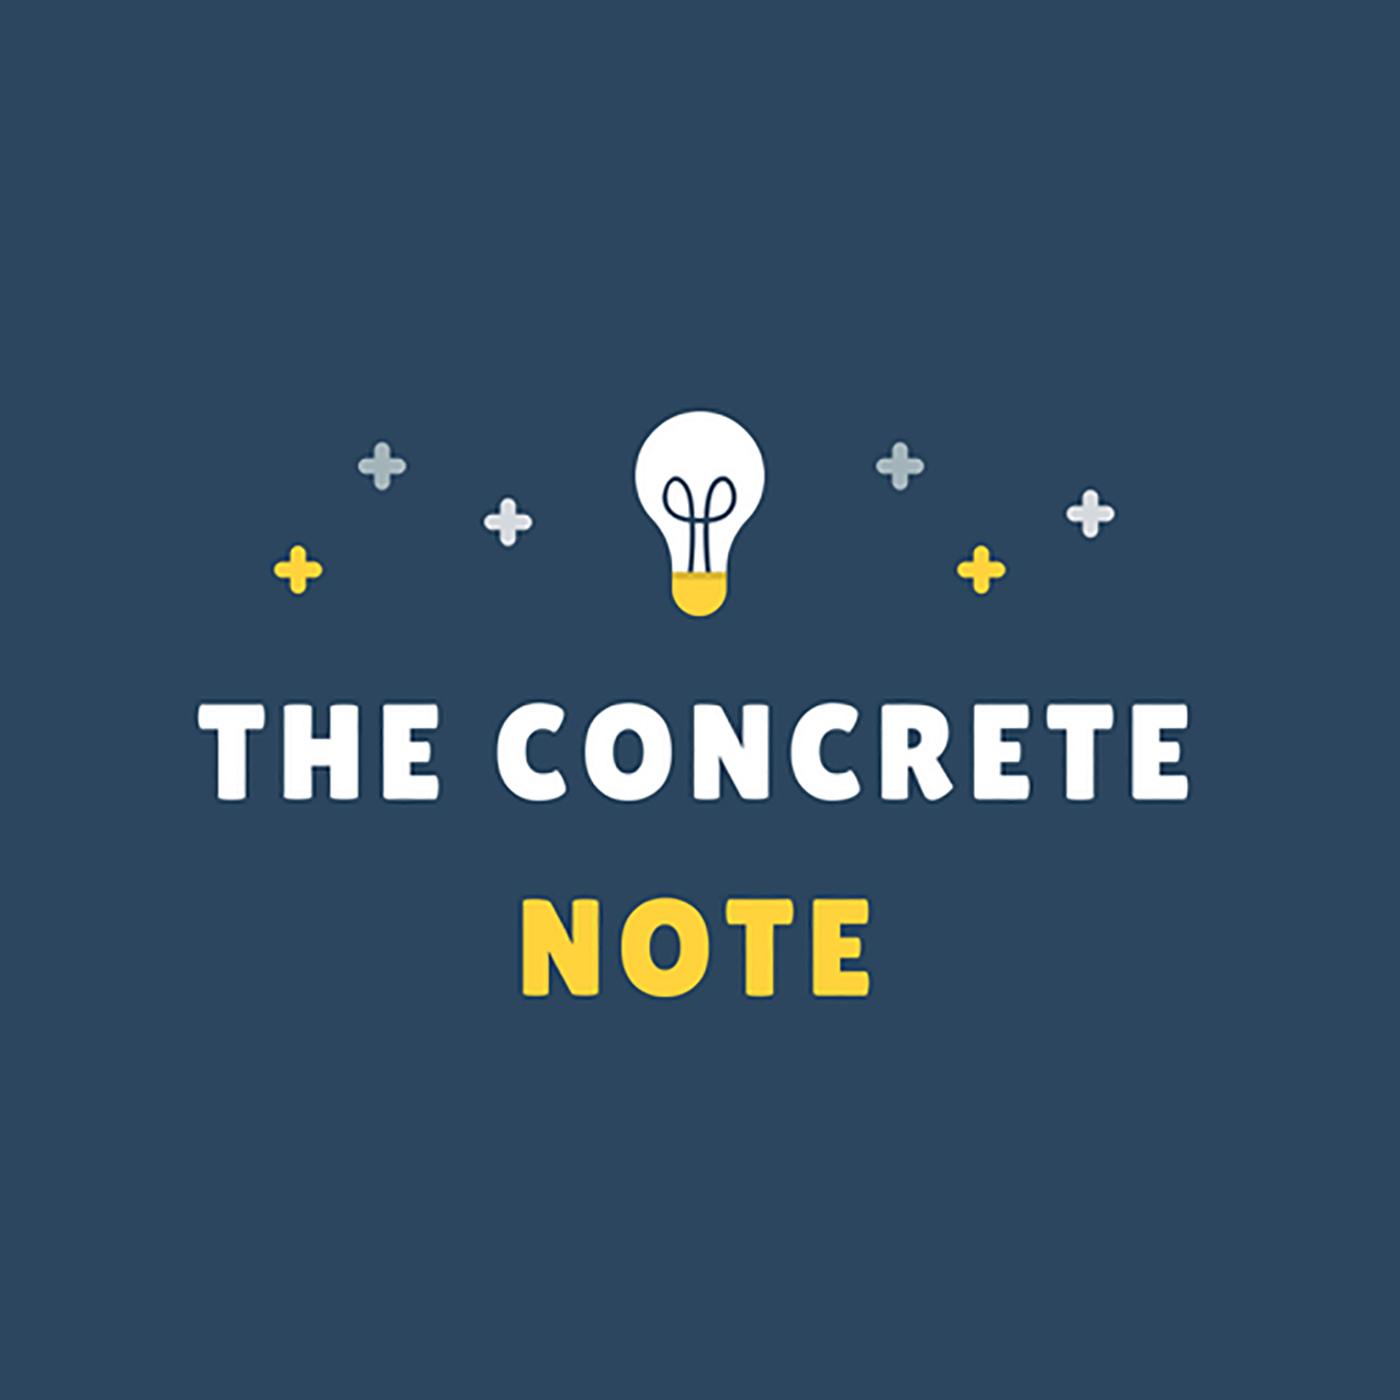 The Concrete Note show image